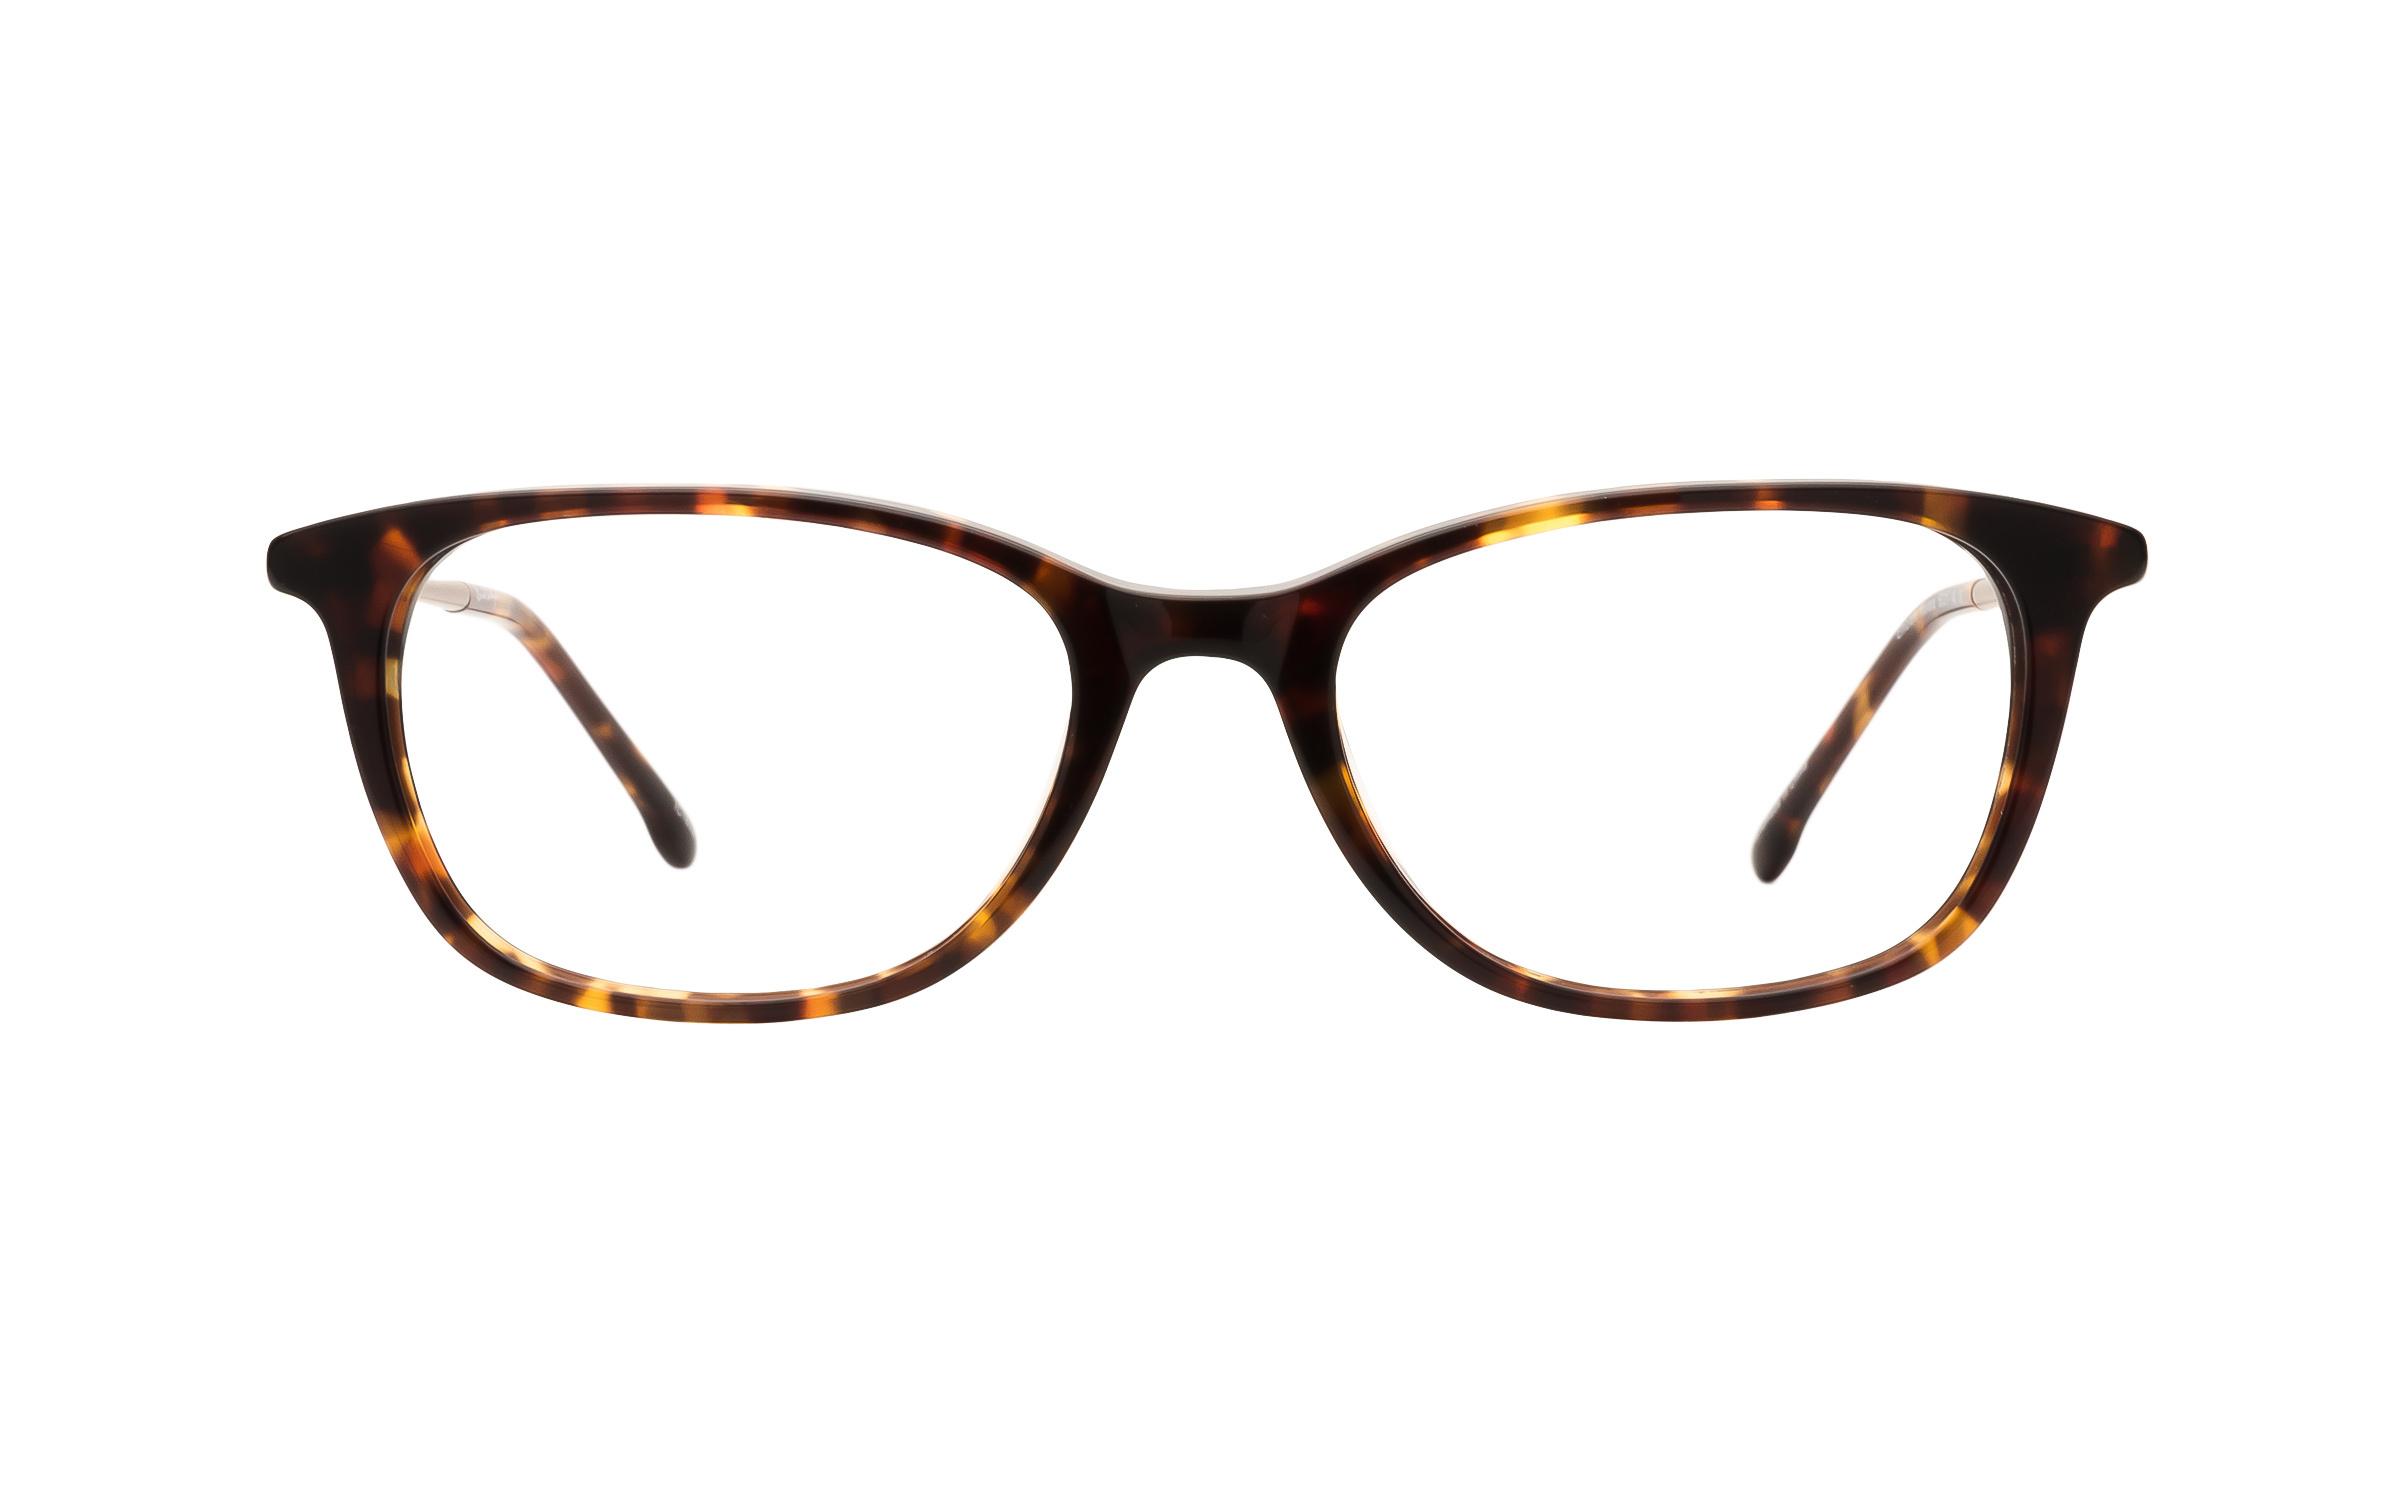 Derek_Cardigan_Womens_Glasses_Rectangular_BrownTortoise_Metal_Online_Coastal